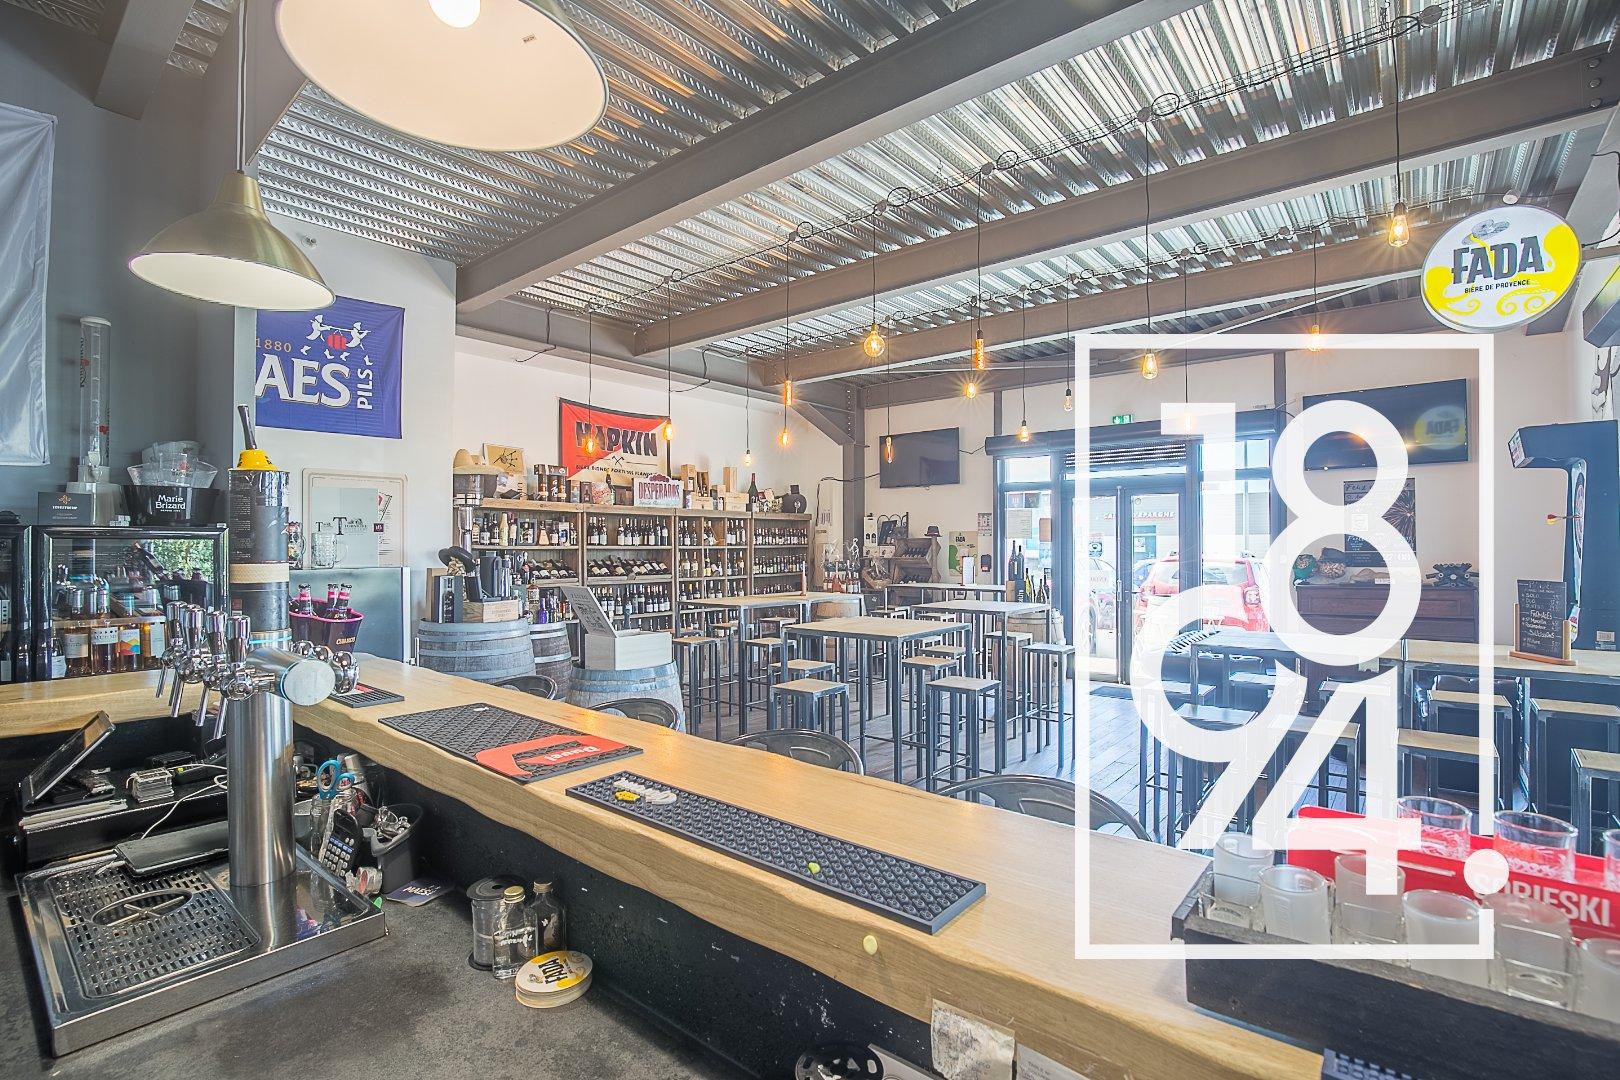 Fond de commerce: brasserie, bar a vin à SENAS